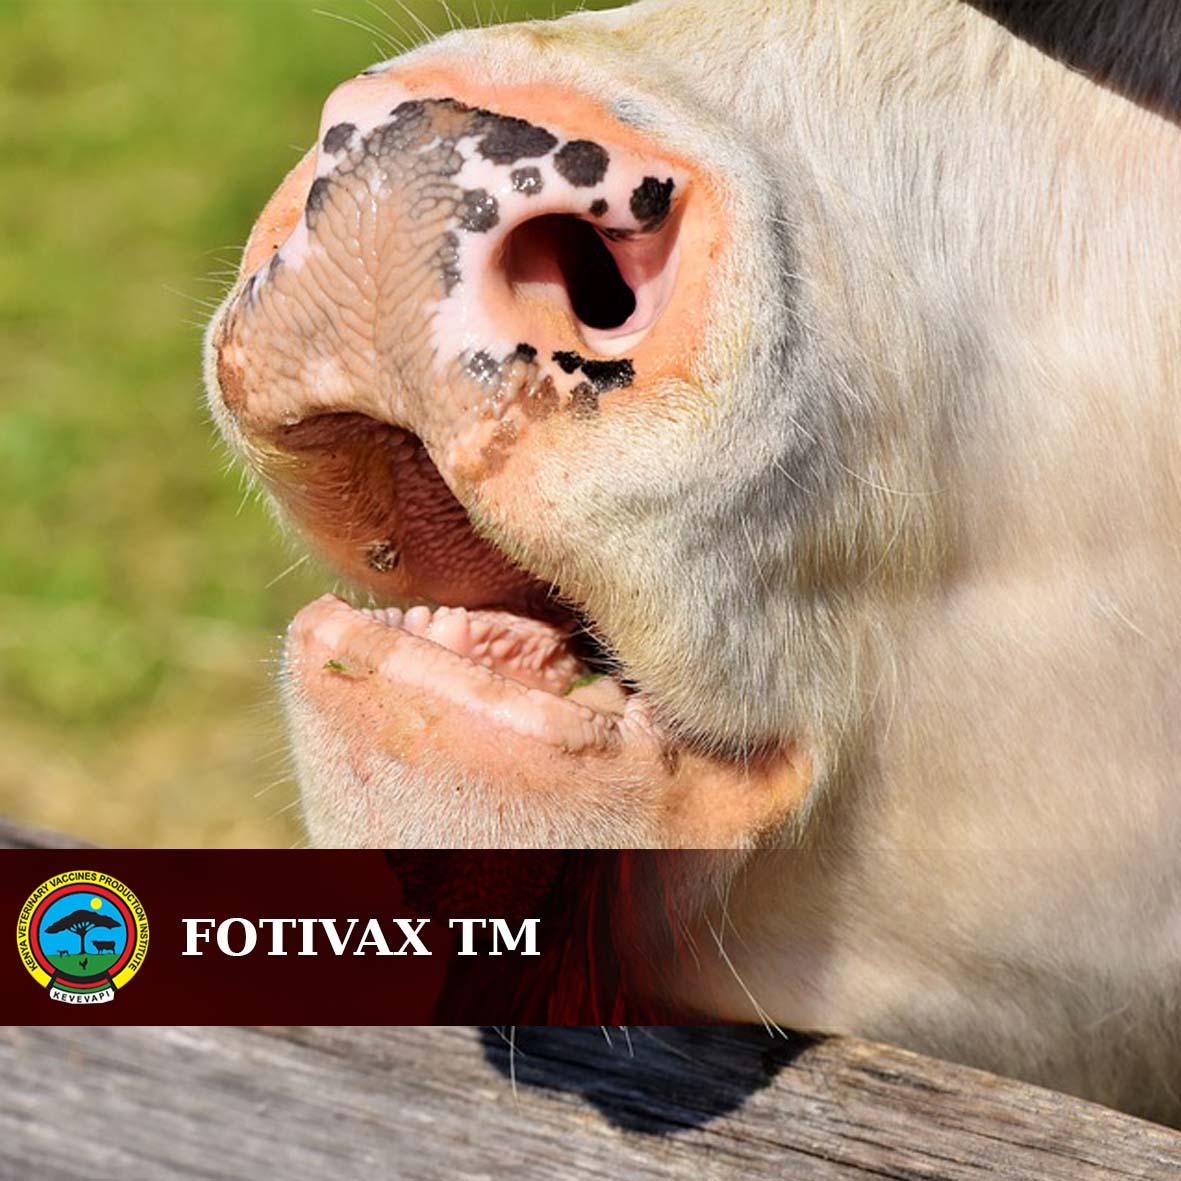 FOTIVAX TM